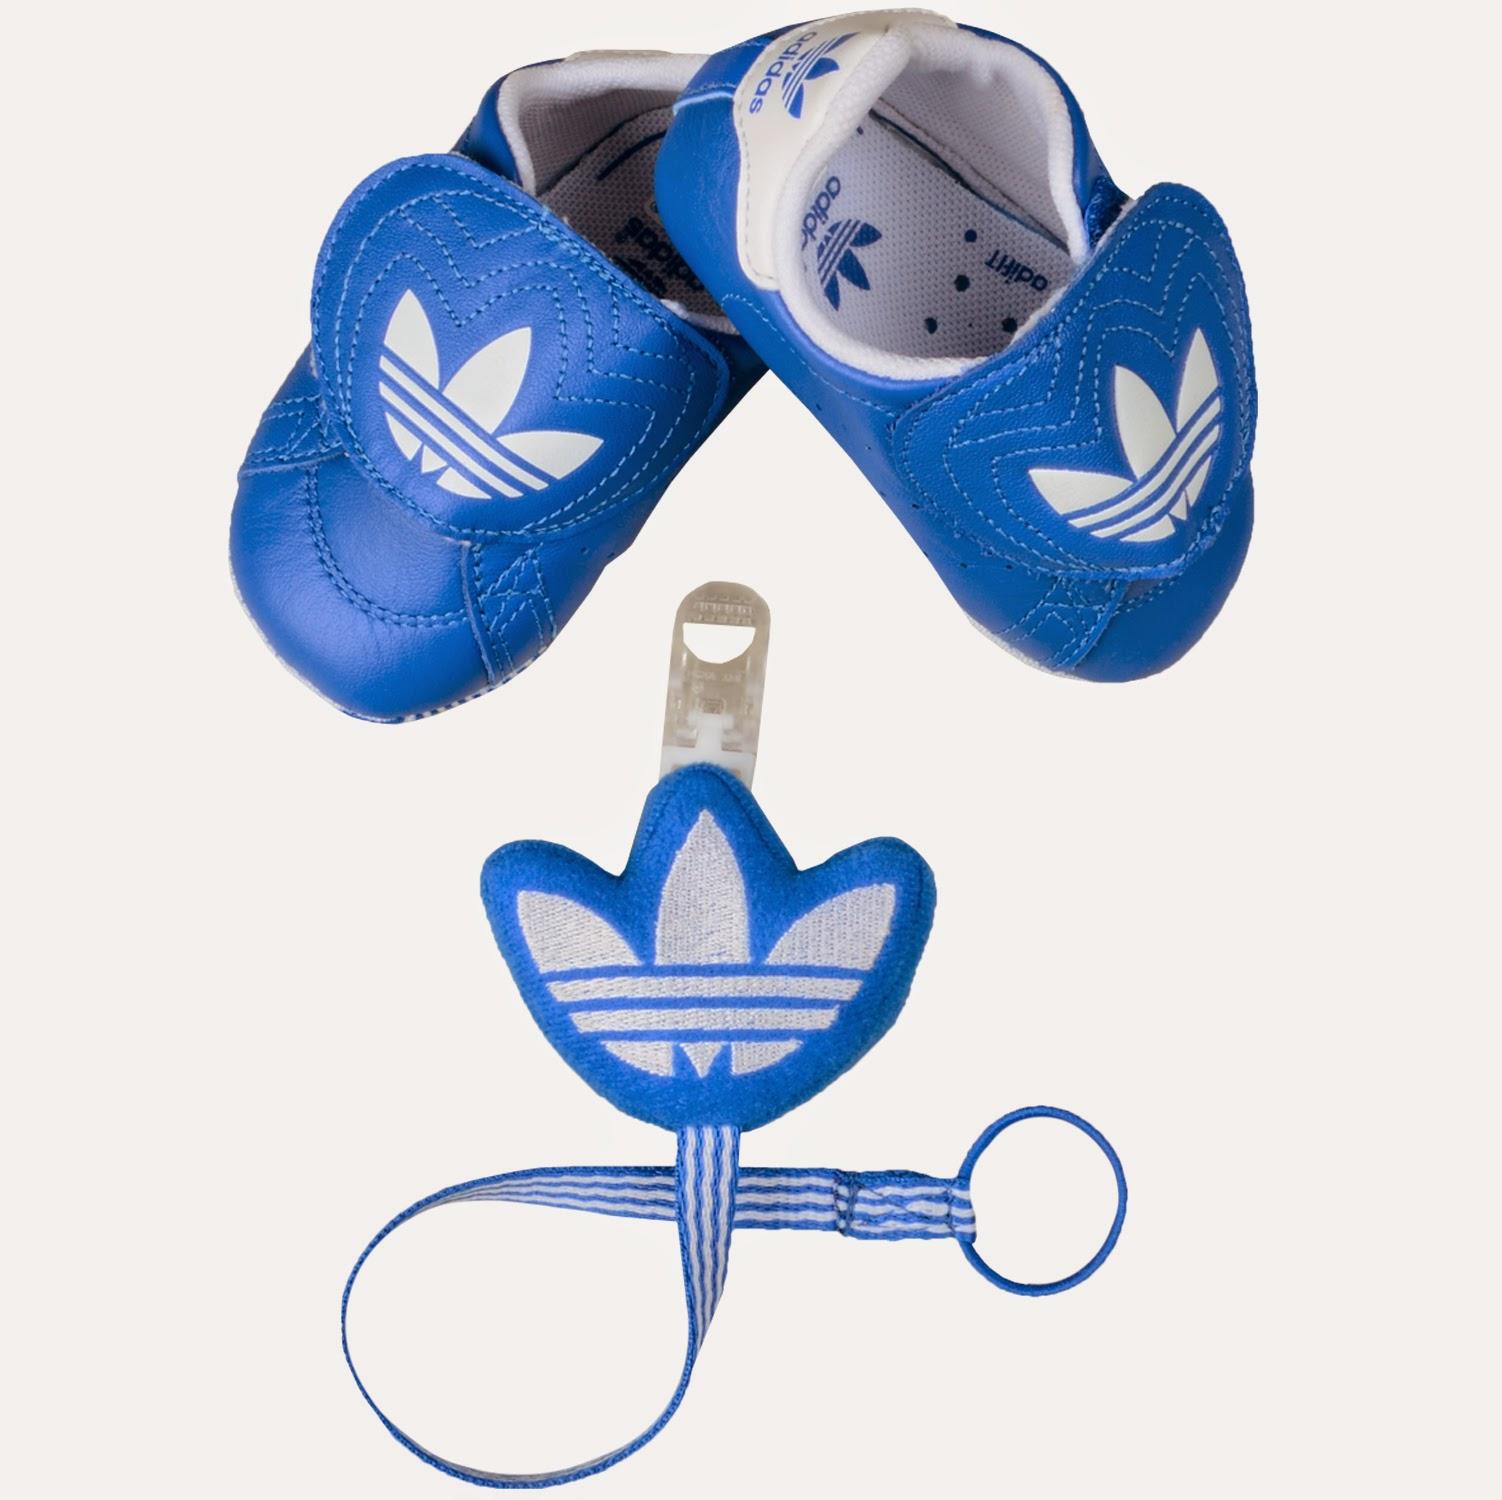 zapatillas adidas España bebes, zapatillas Zapatillas Adidas Adidas Online España | f305a55 - colja.host